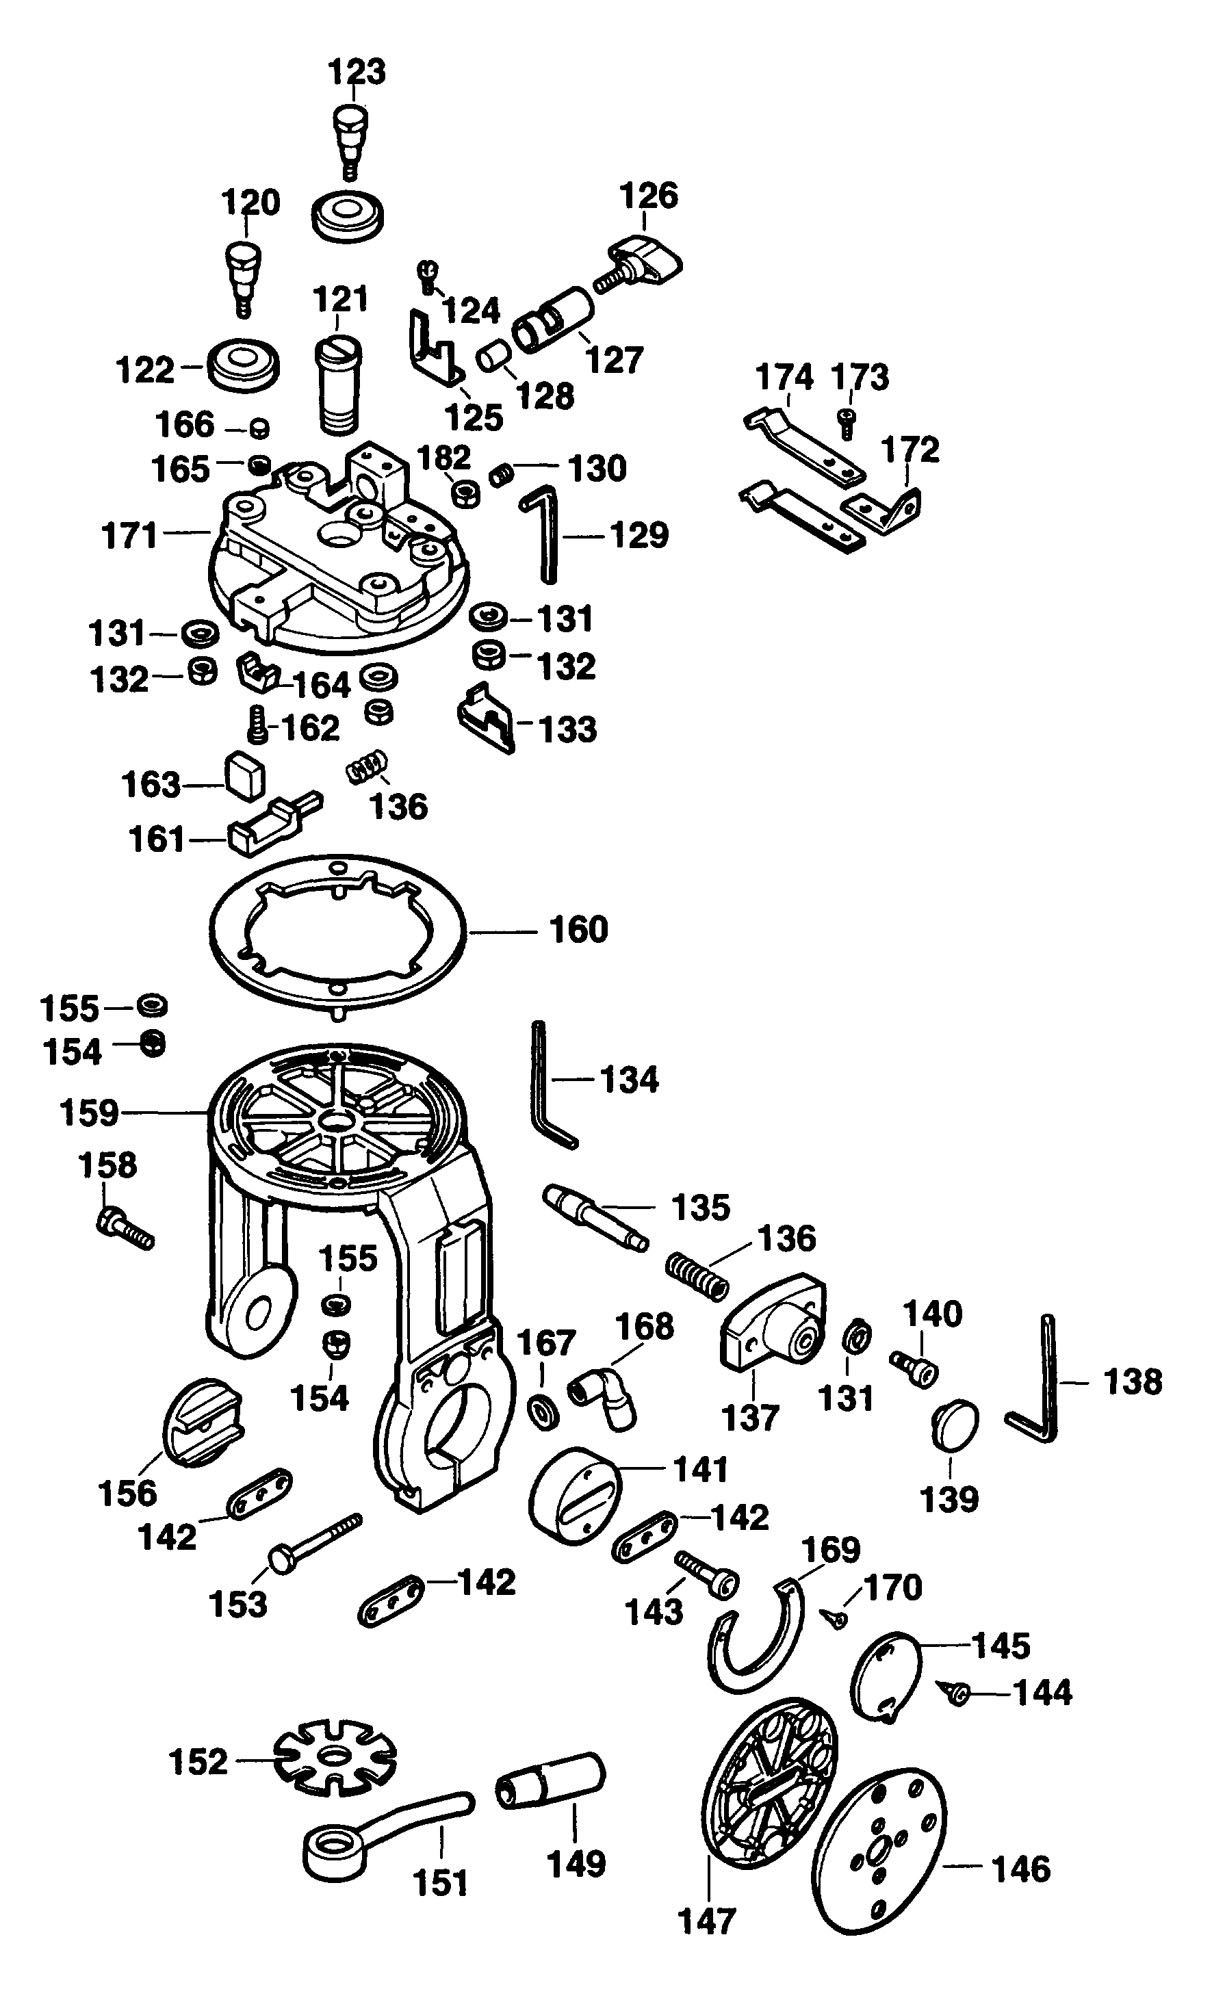 Spares for Dewalt Dw721 Radial Arm Saw (type 2) SPARE